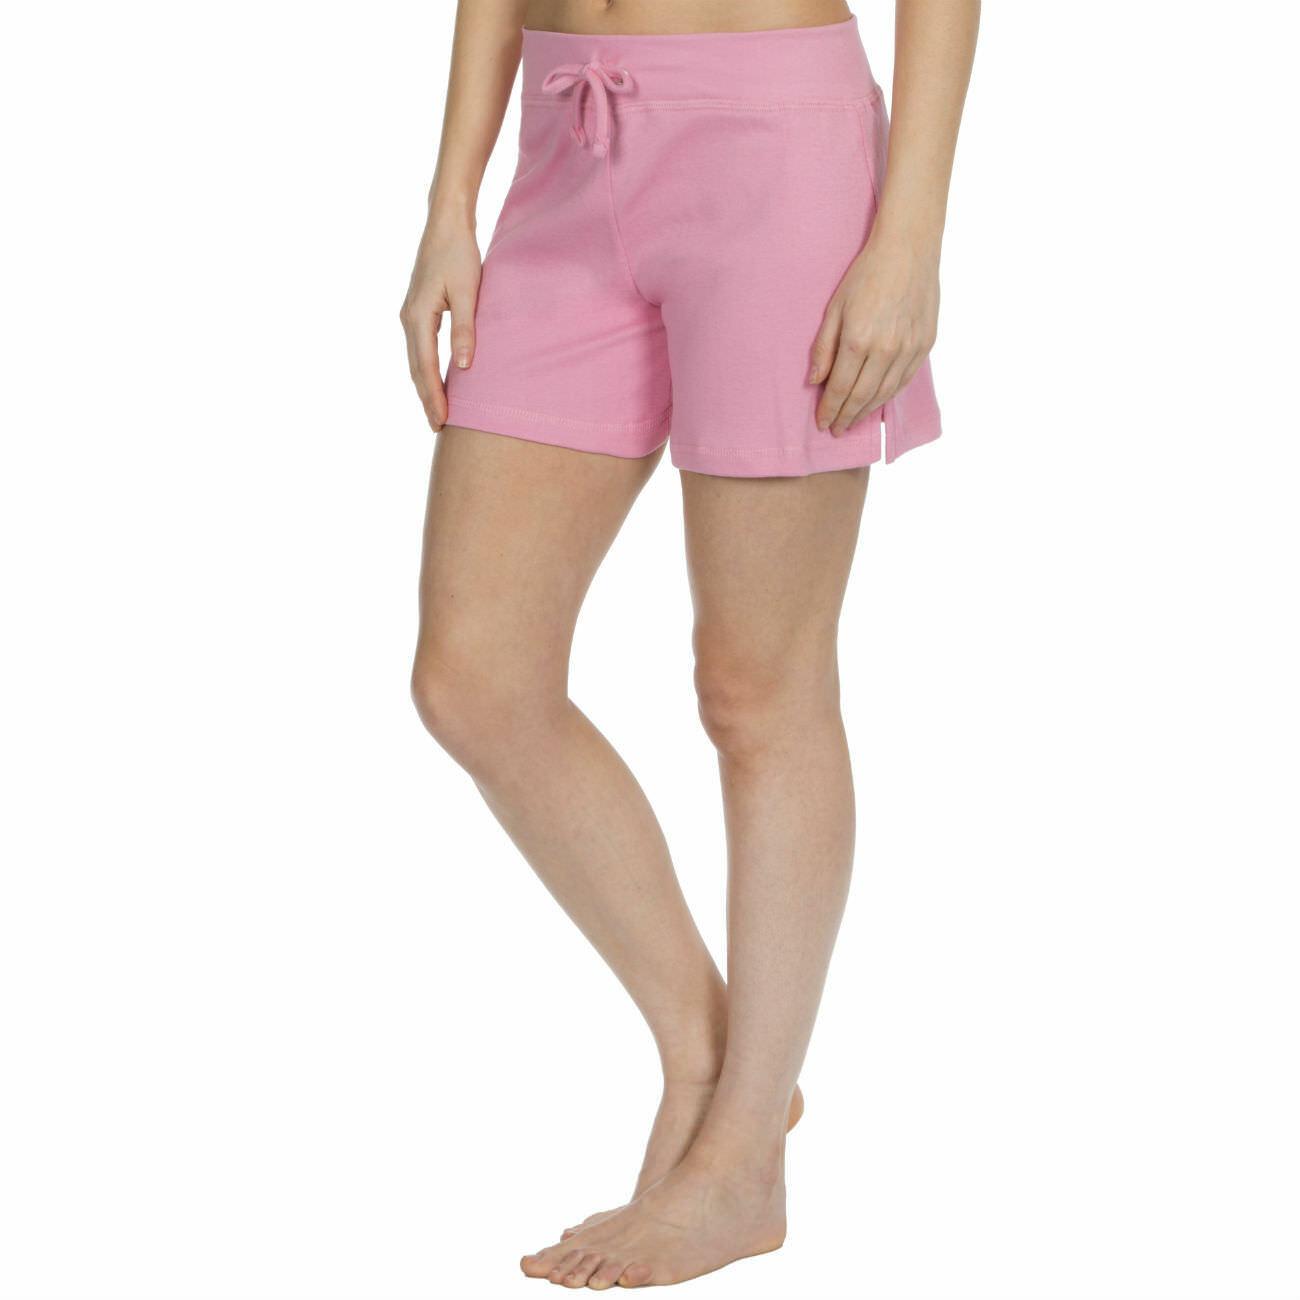 Womens-Cotton-Jersey-Shorts-Elastic-Waist-Summer-Beach-Casual-Yoga-Hot-Pants-New thumbnail 17